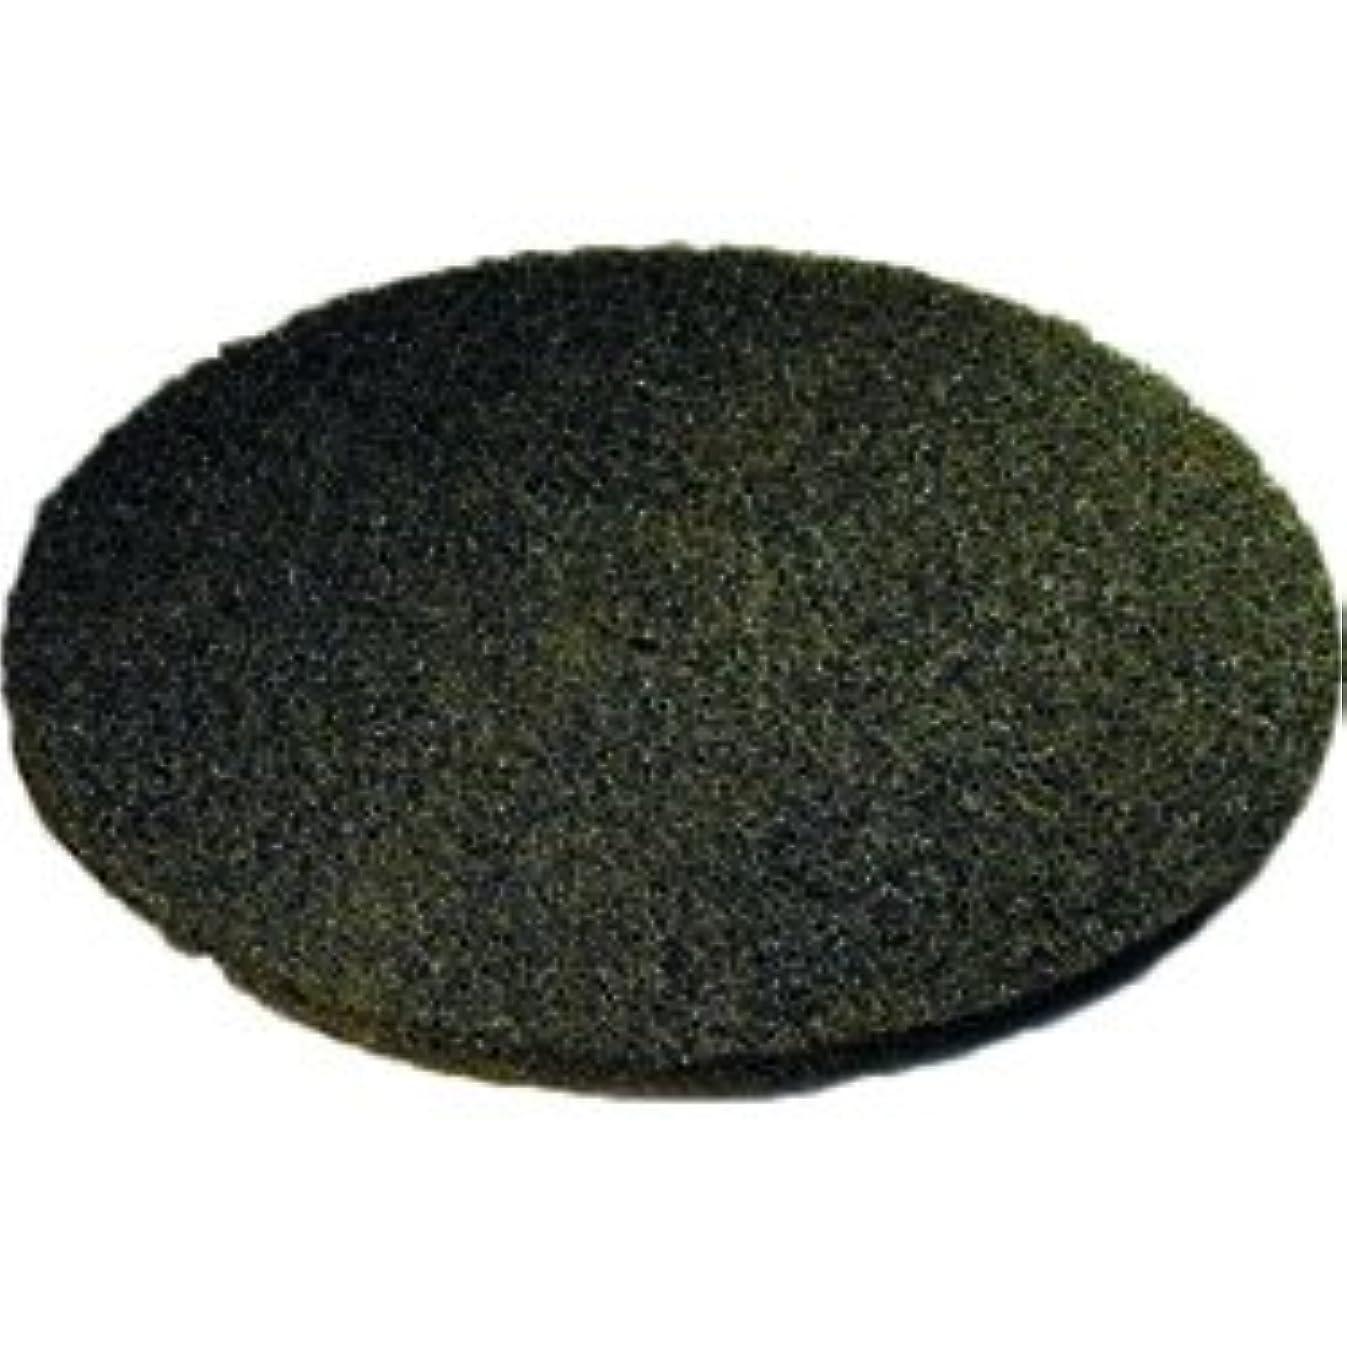 Scrubble 72-17 Type 72, Stripping Floor Pad, 17